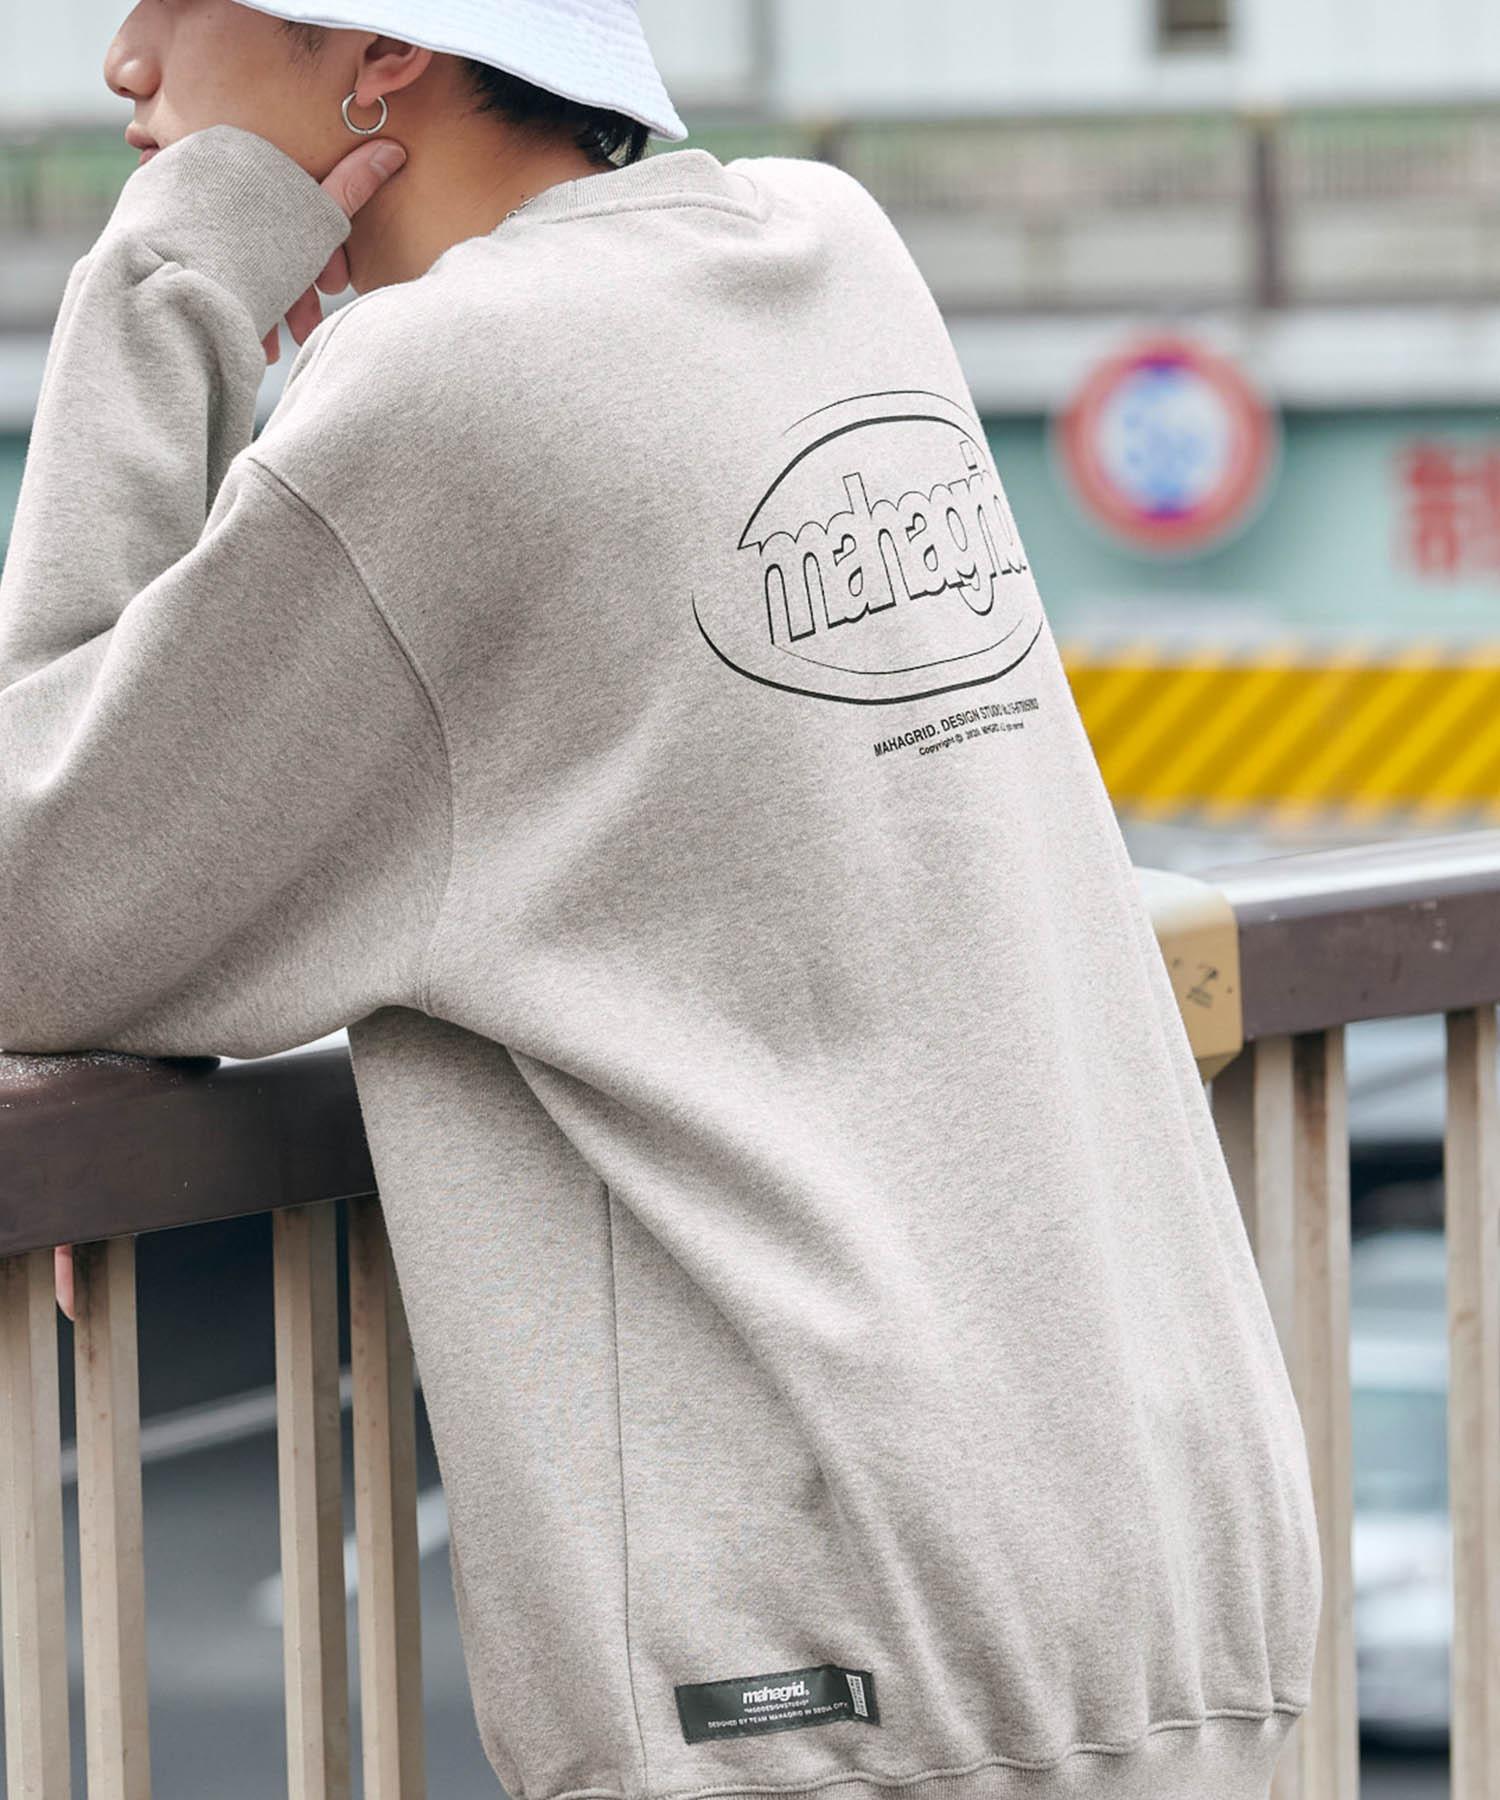 MAHAGRID/マハグリッド  MARU LOGO/OVAL LOGO SWEAT SHIRT ロゴデザイン オーバーサイズプルオーバースウェット [韓国ストリートブランド]